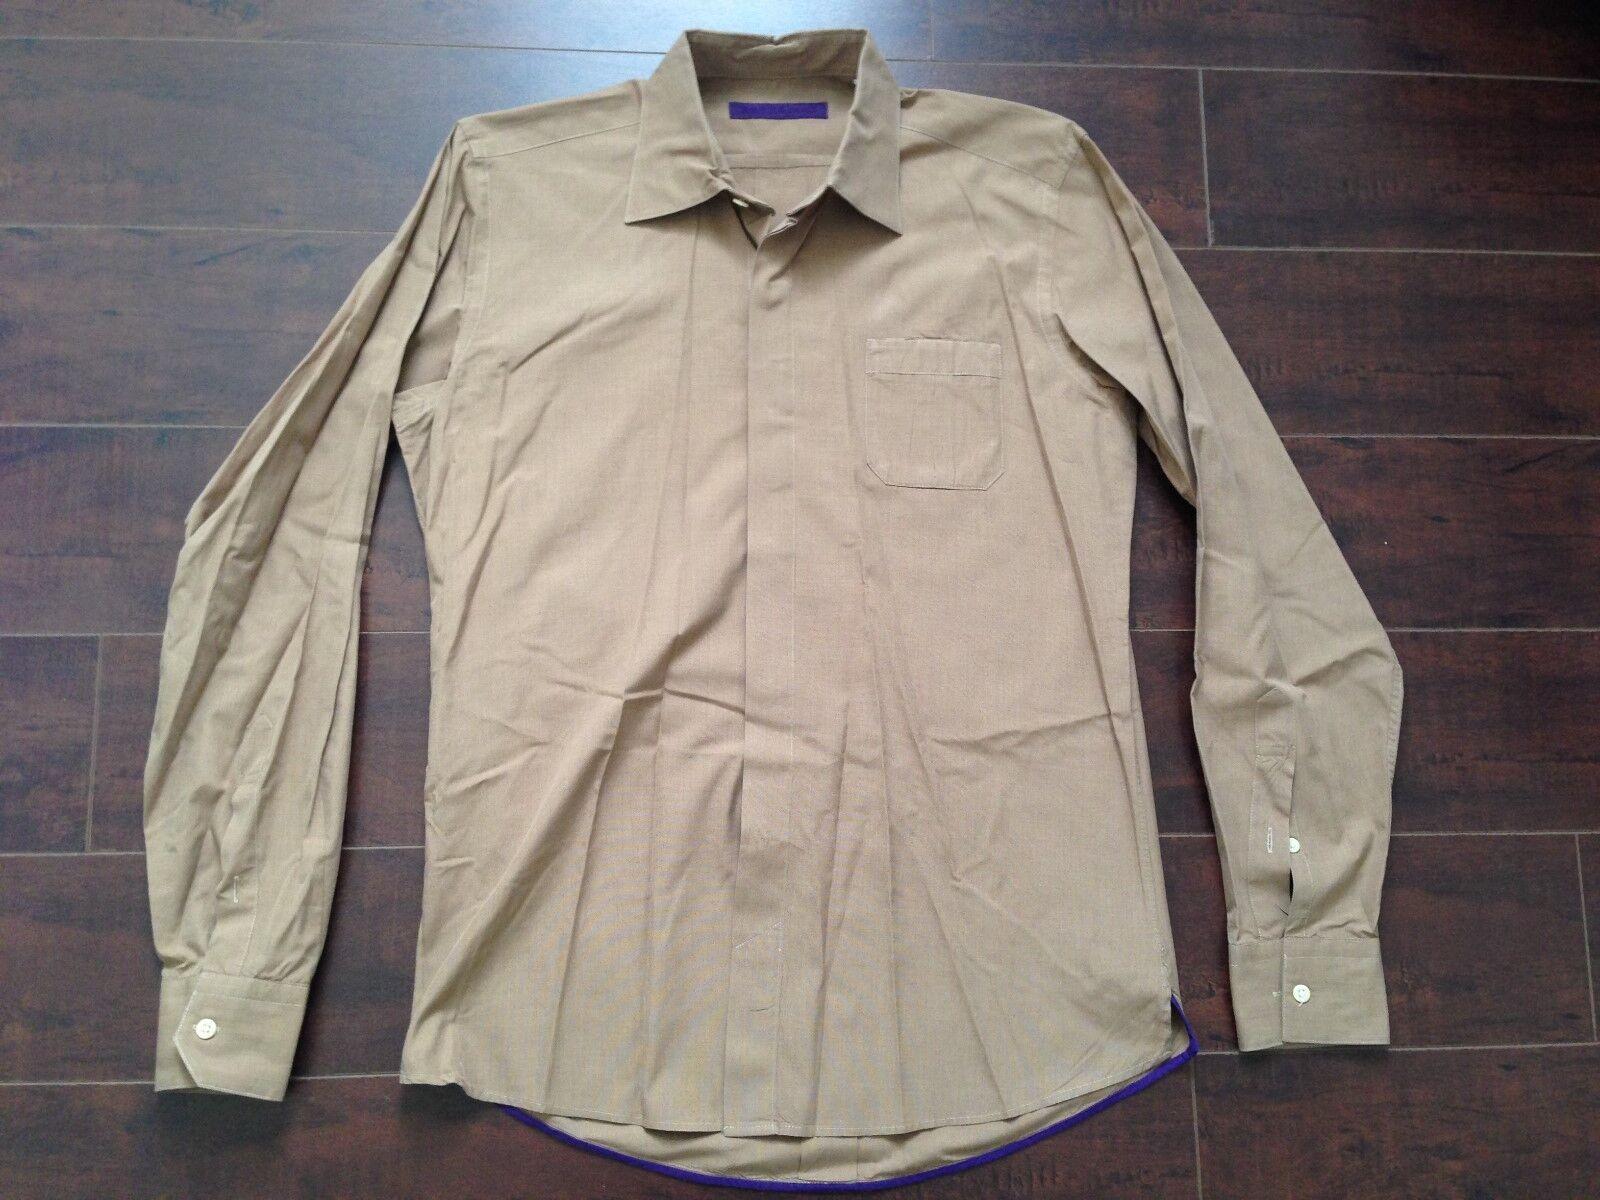 NWOT JEAN-PIERRE RAMOS Brown Fashion Dress Shirt - S